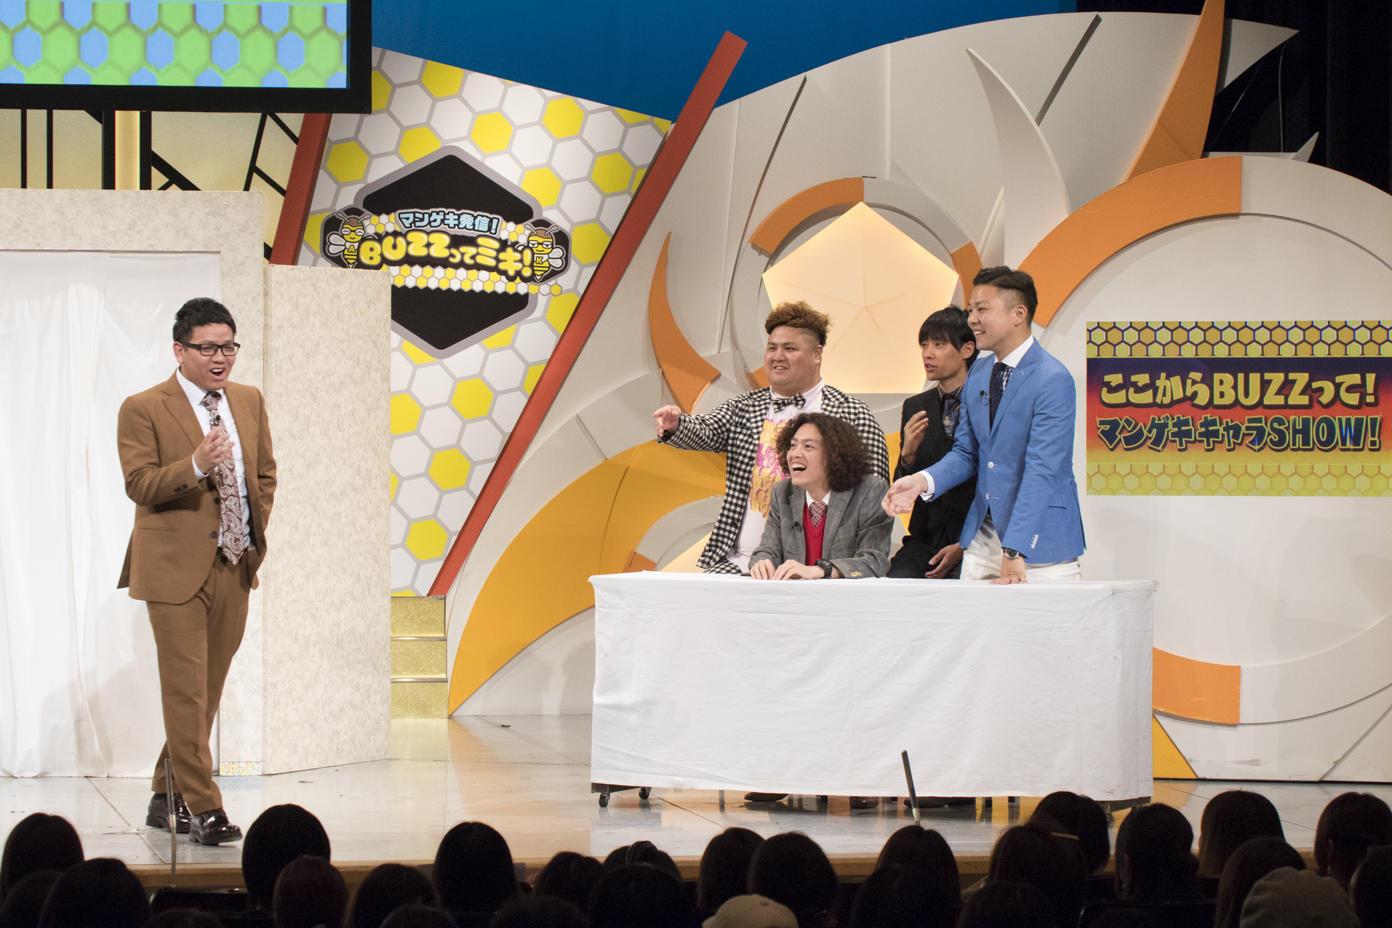 http://news.yoshimoto.co.jp/20170908065326-db165d696686d8e6a254b9c636735923e41f6b84.jpg